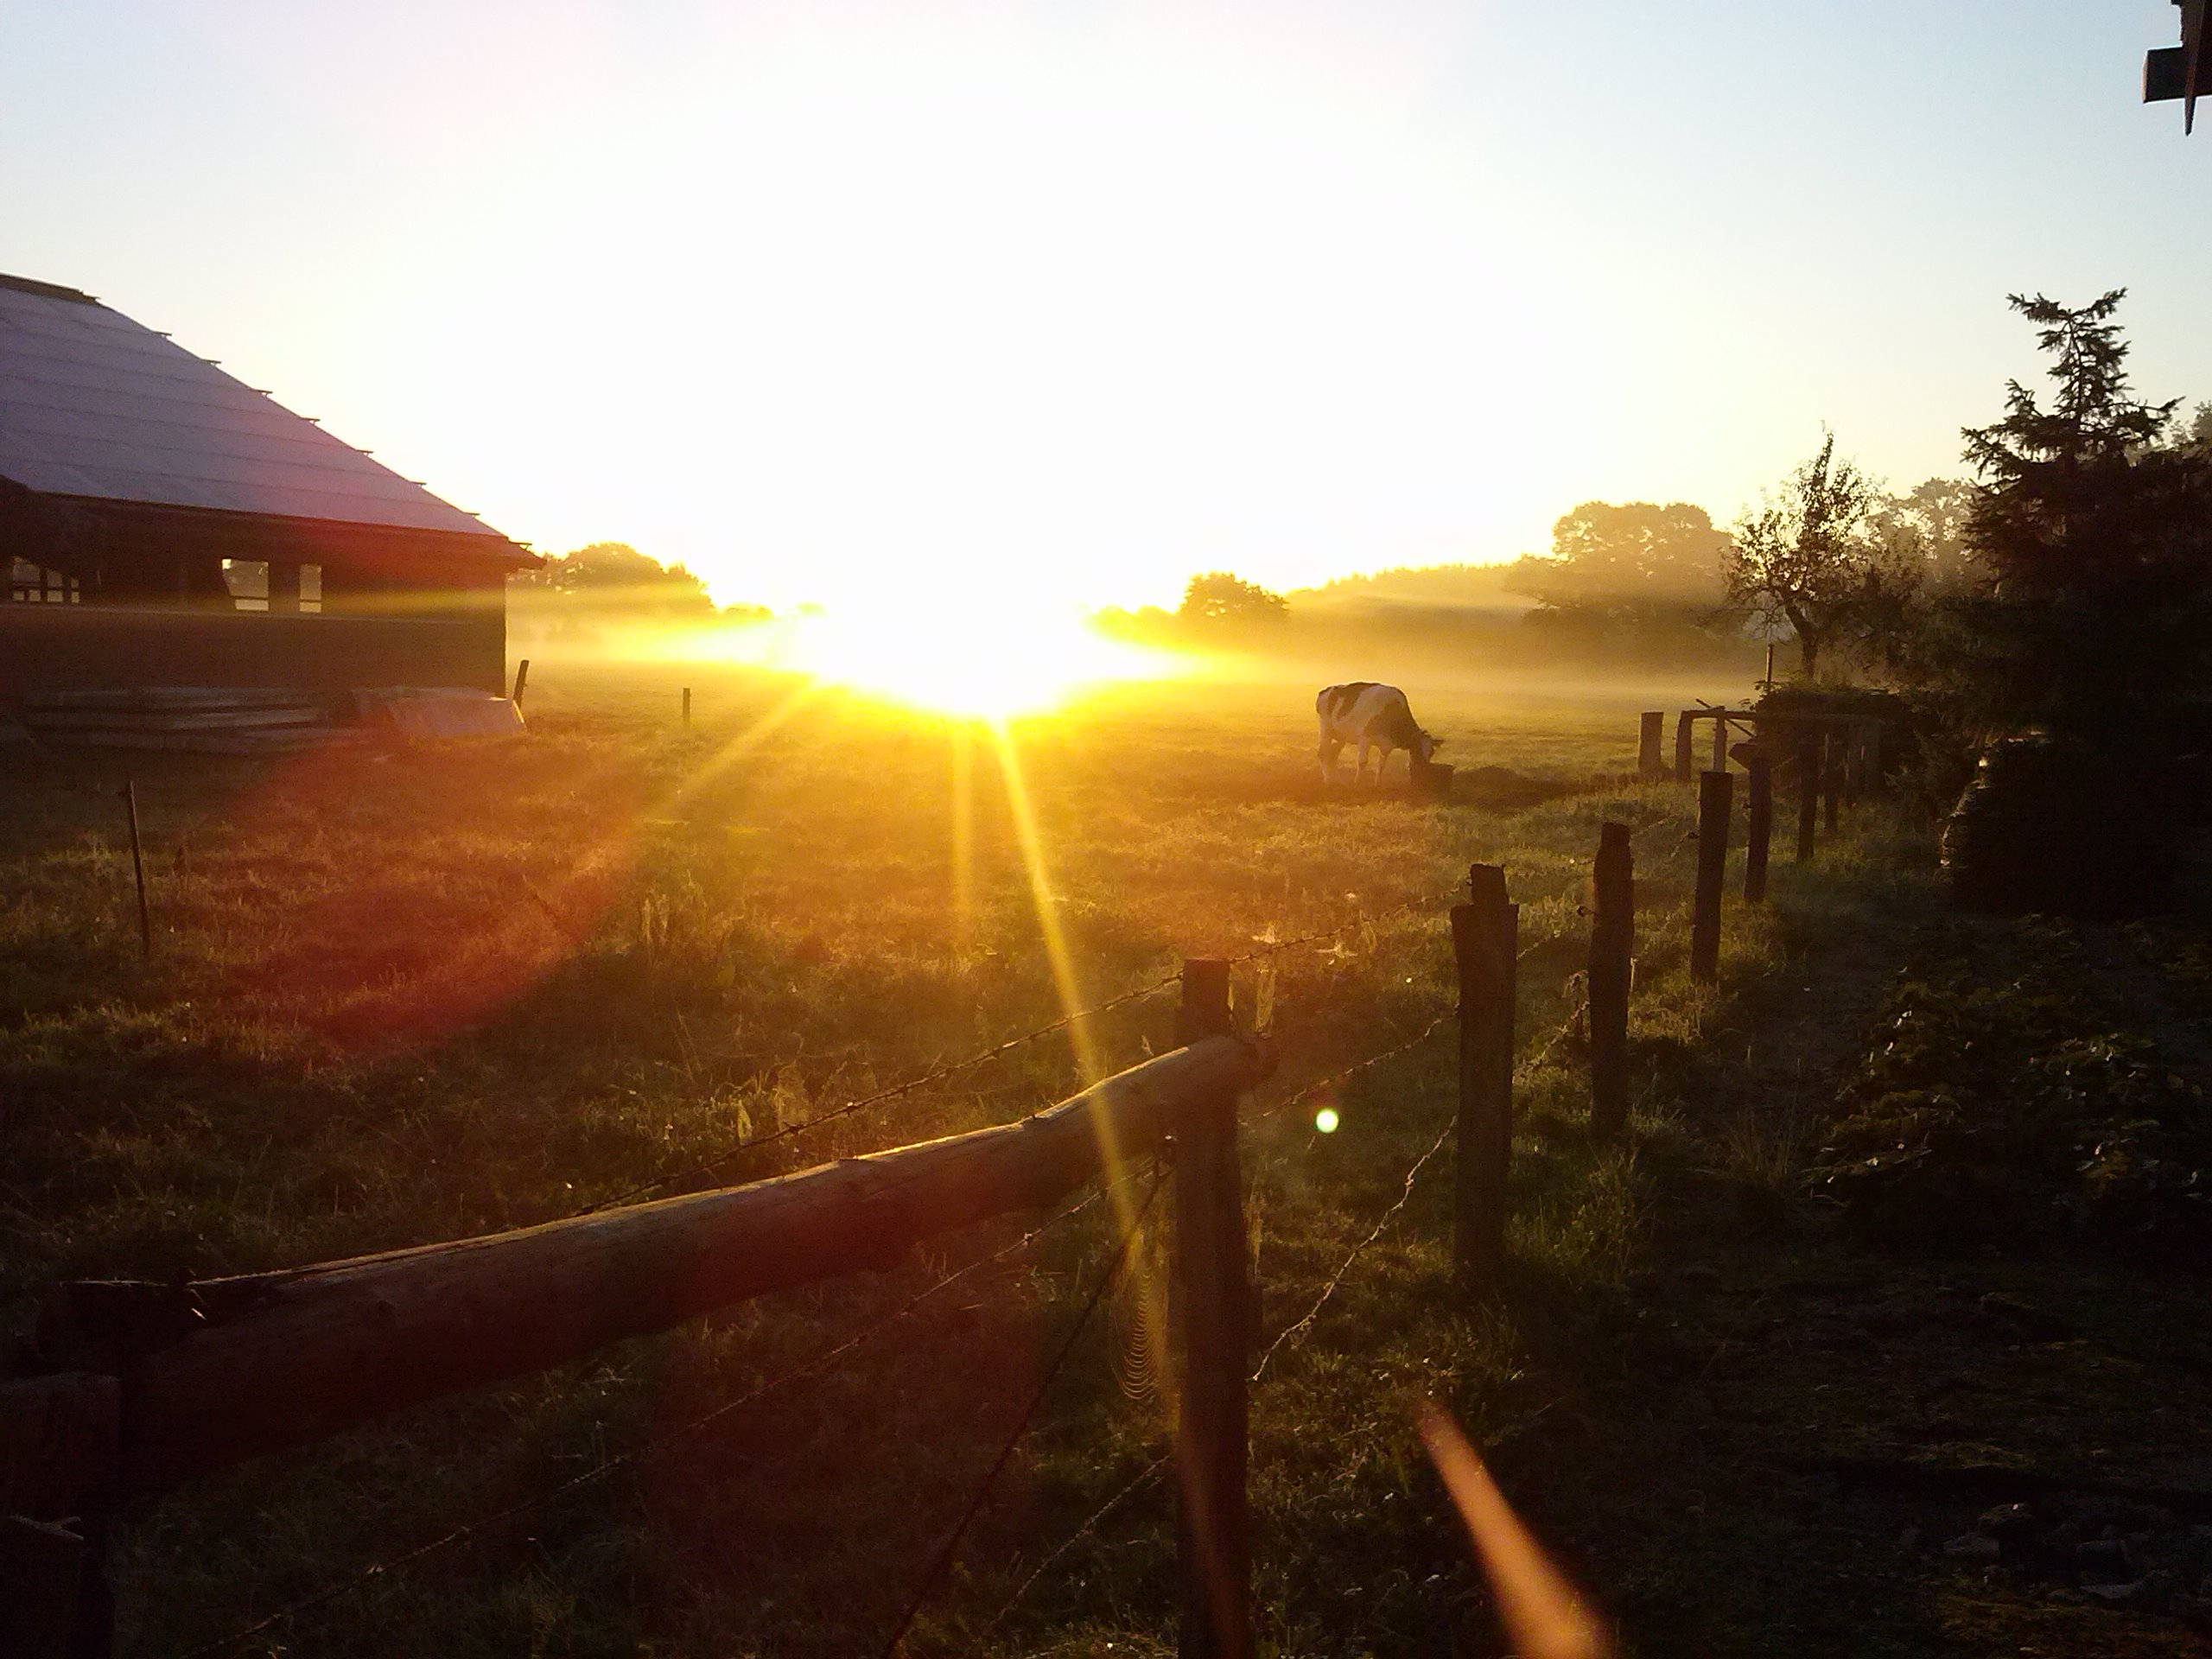 Kühe im Morgengrauen bei Sonnenaufgang